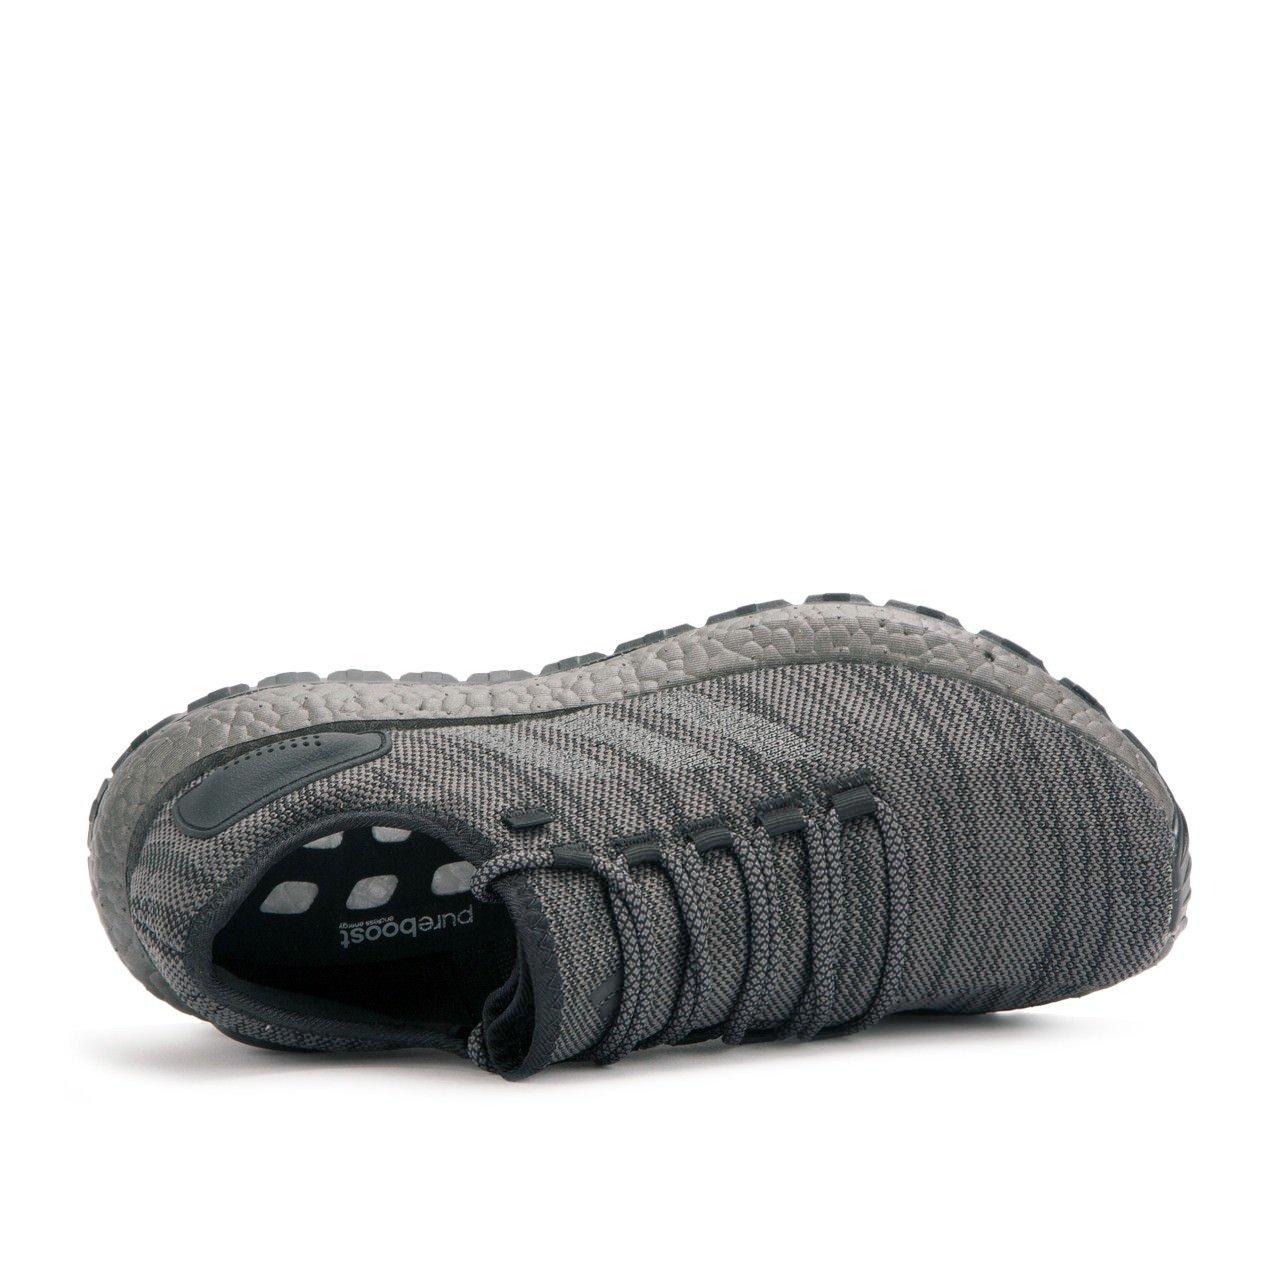 728401bcca8158 usa mens shoes sneakers adidas pureboost all terrain triple black 310a0  797bb